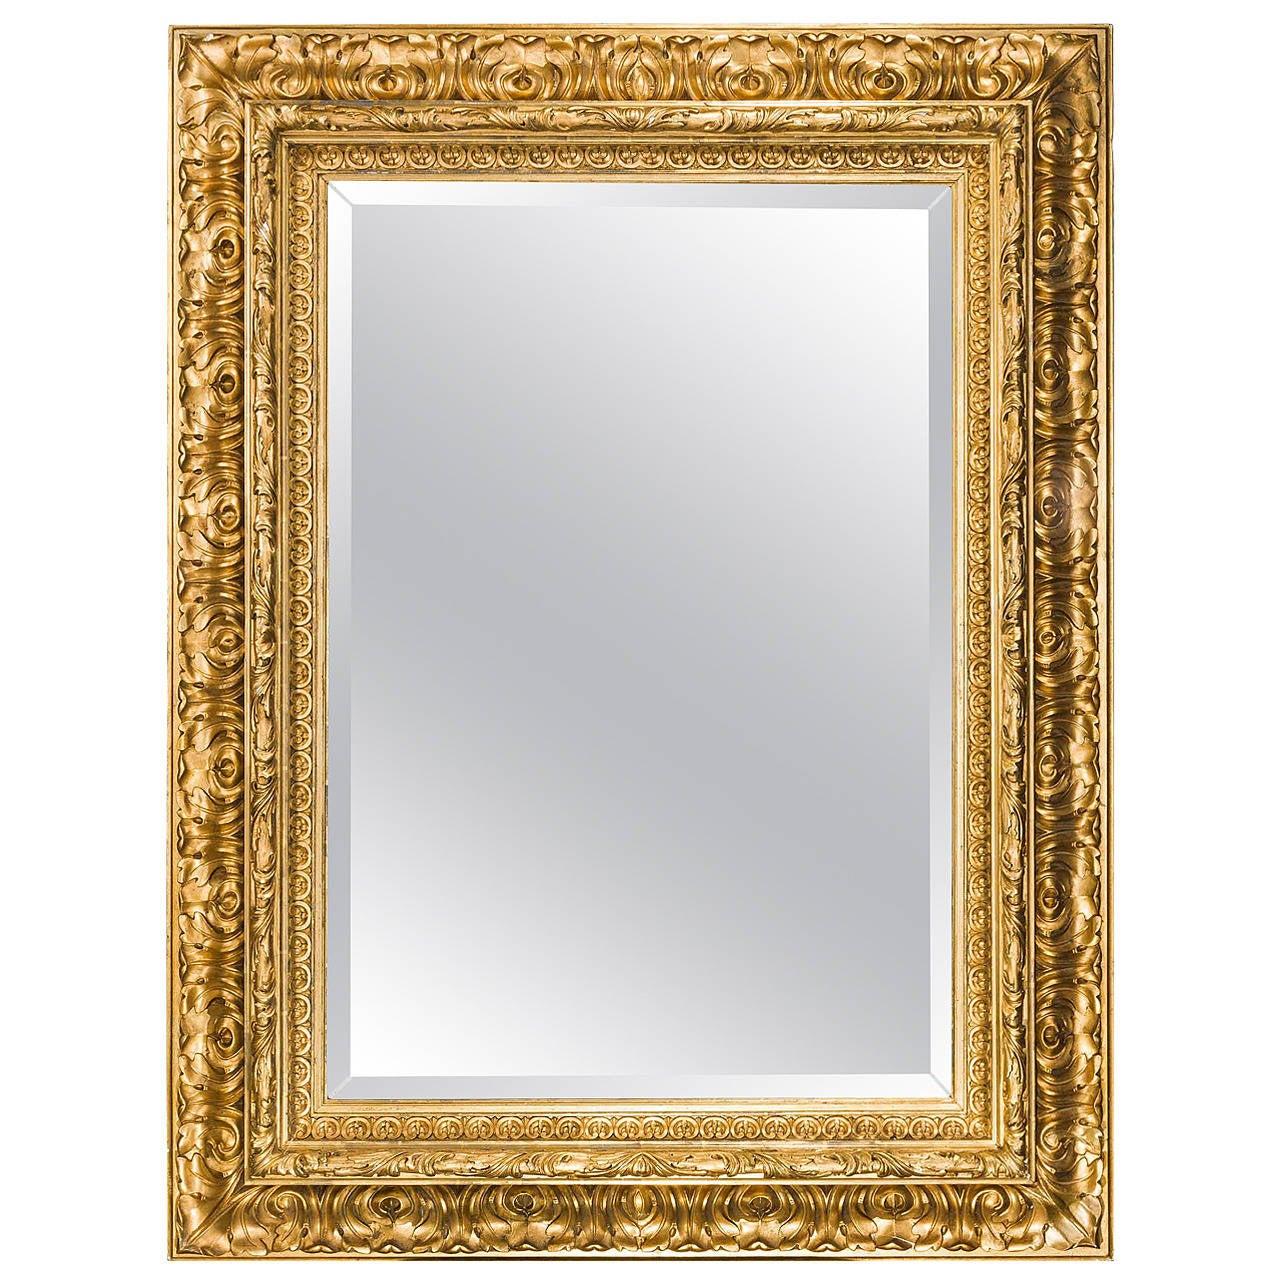 fine italian 19th century giltwood mirror for sale at 1stdibs